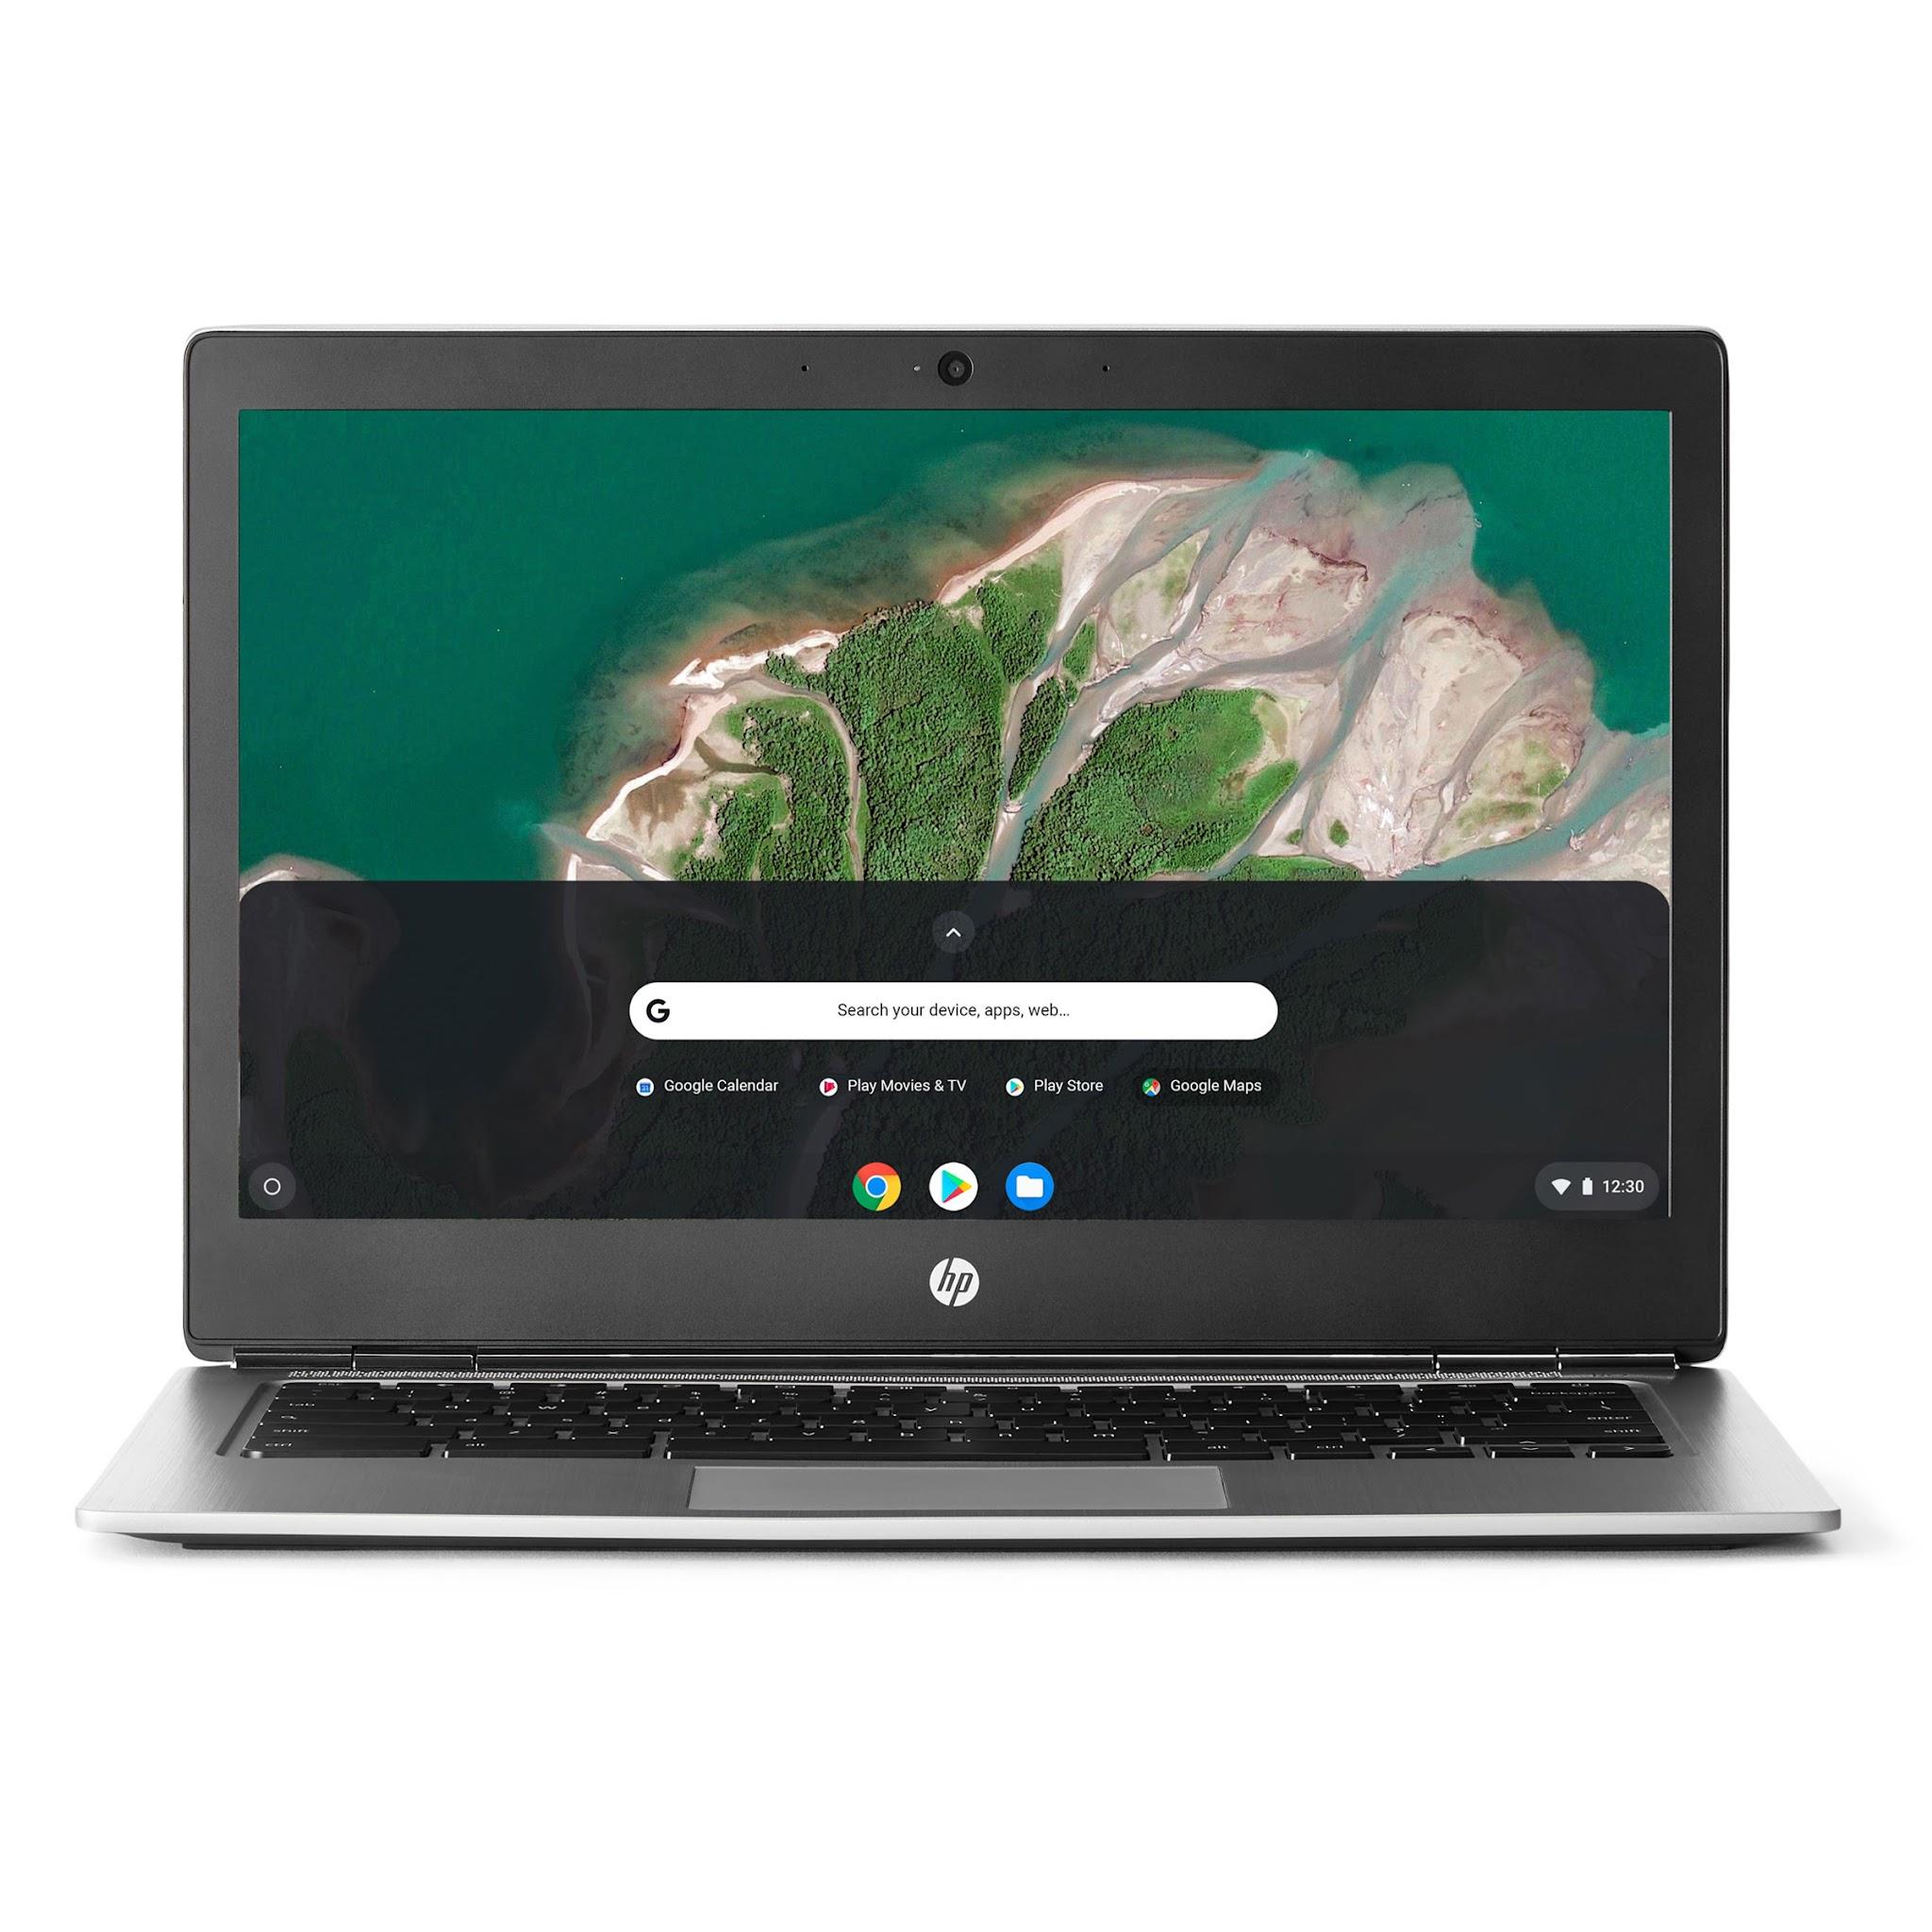 HP Chromebook 13 G1 - photo 1